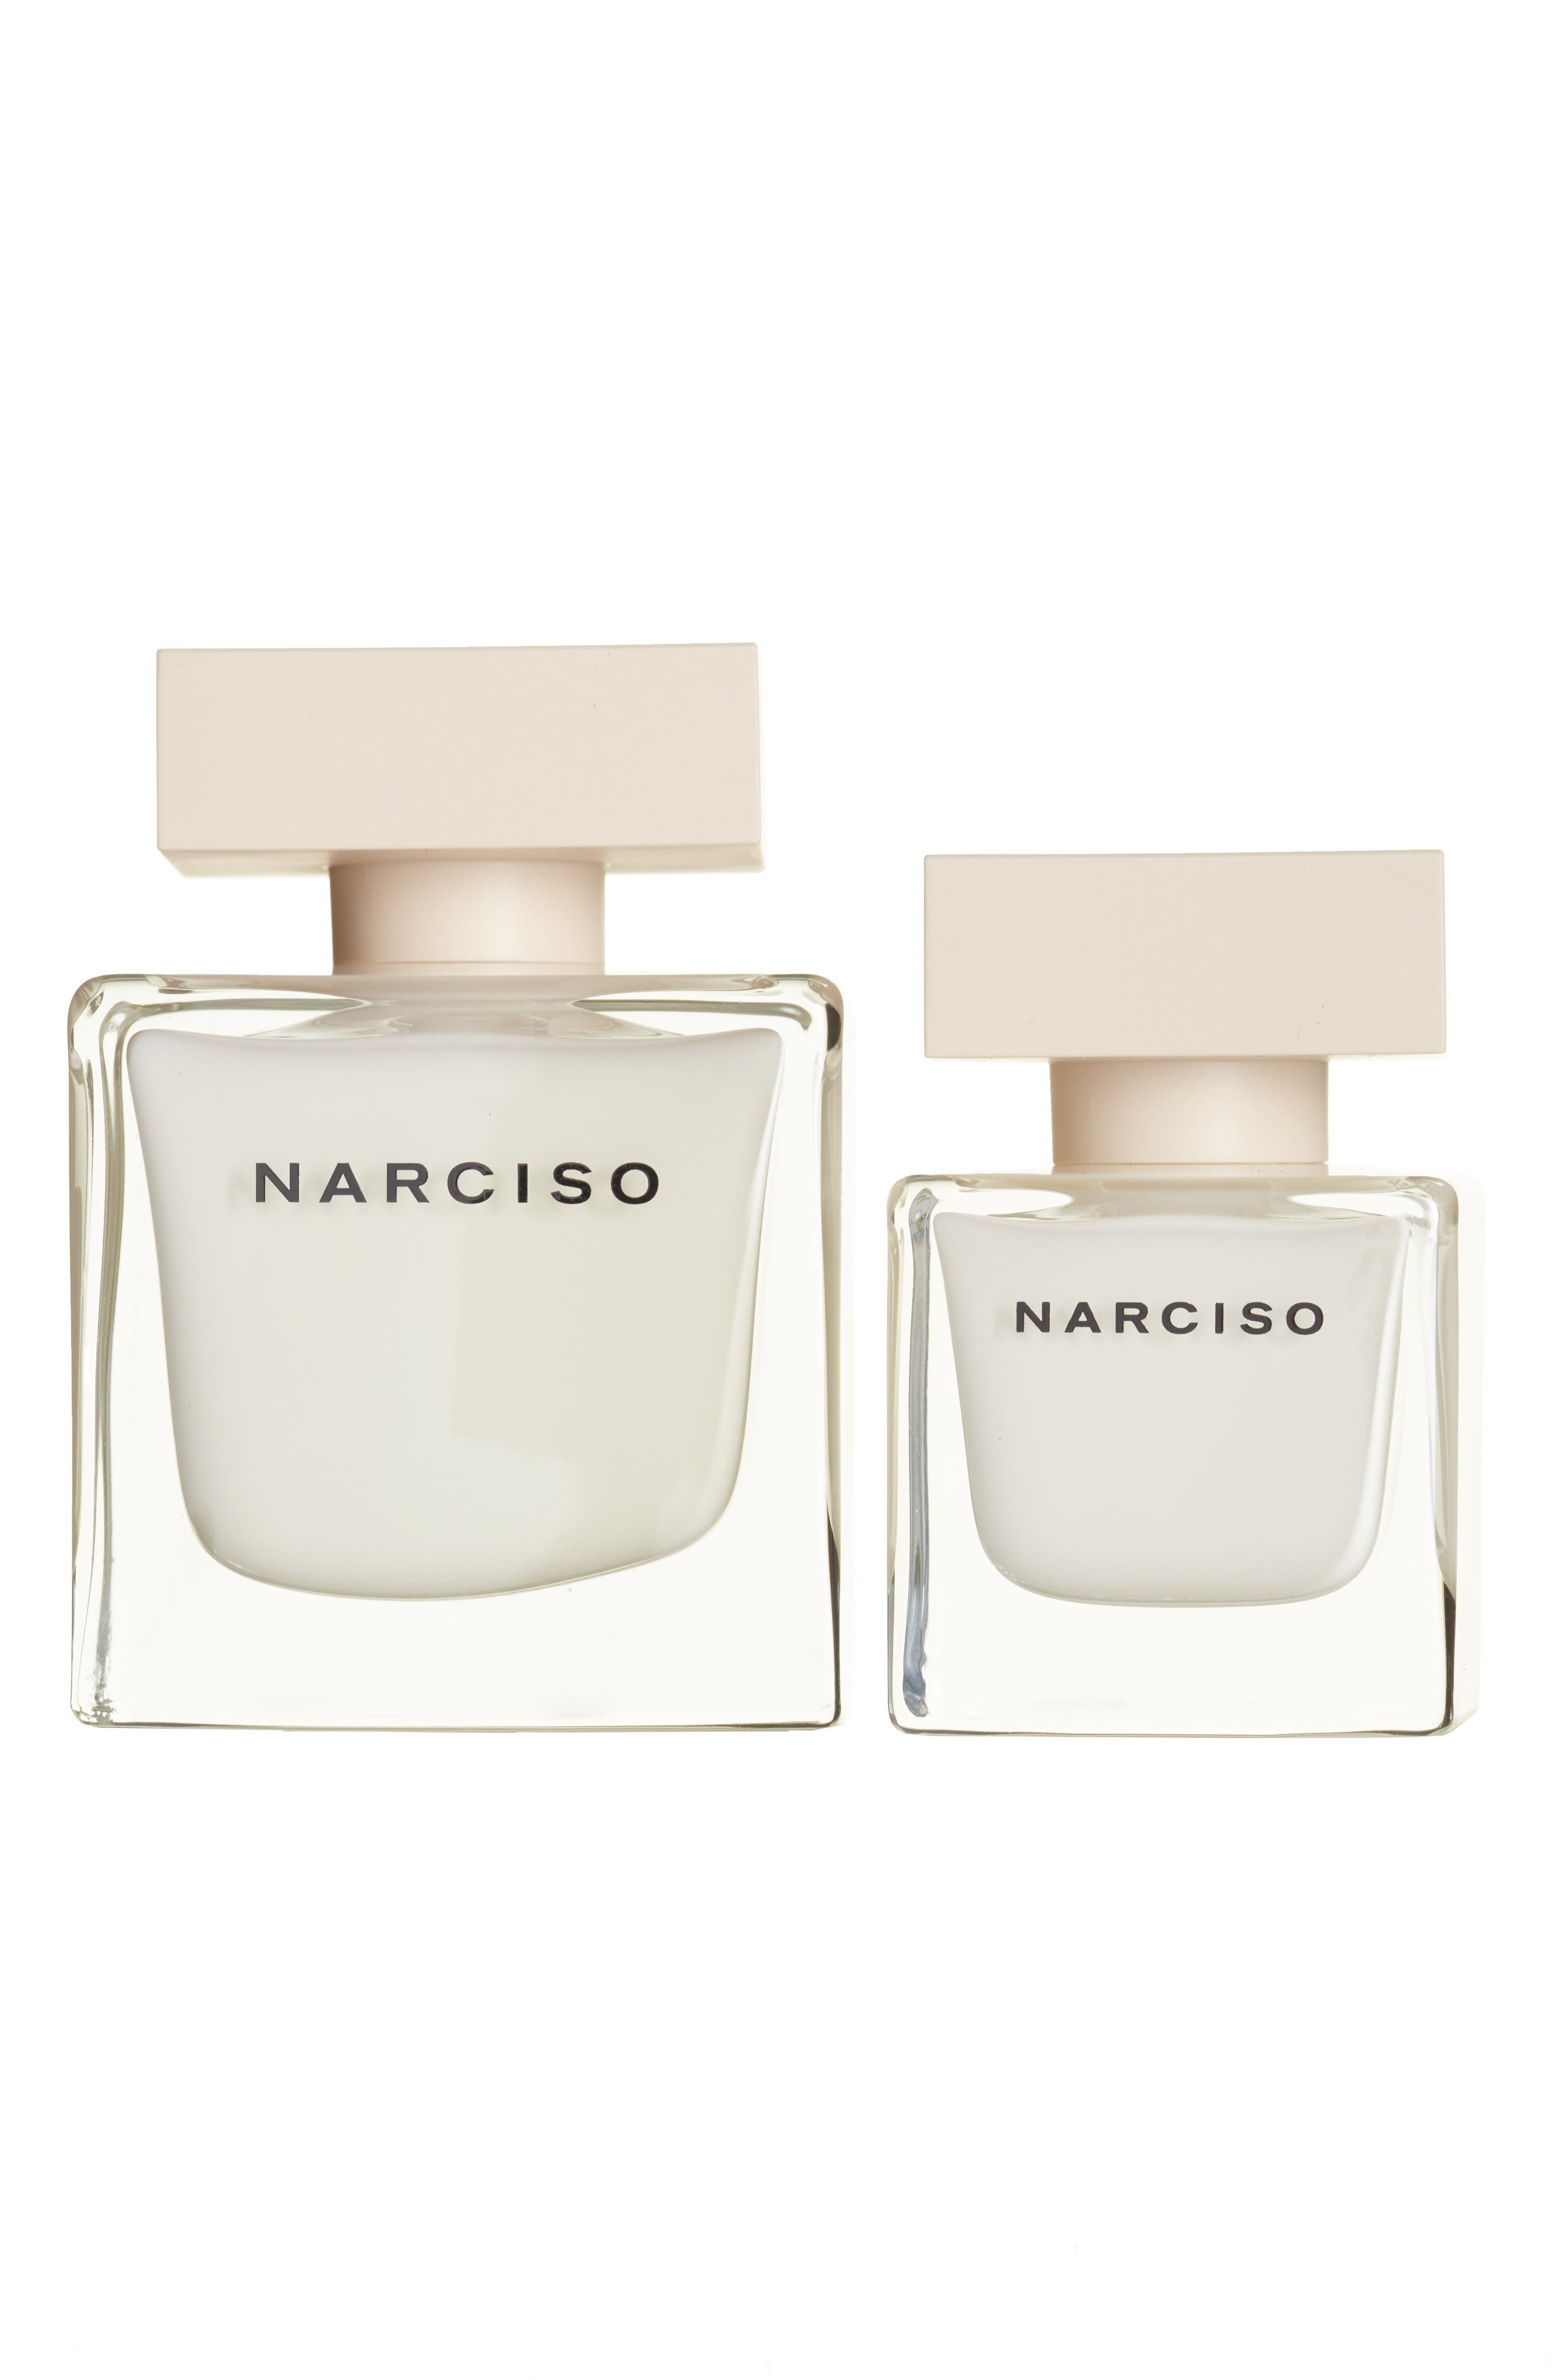 Alternate Image 1 Selected - Narciso Rodrigeuz Narciso Eau de Parfum Set ($177 Value)